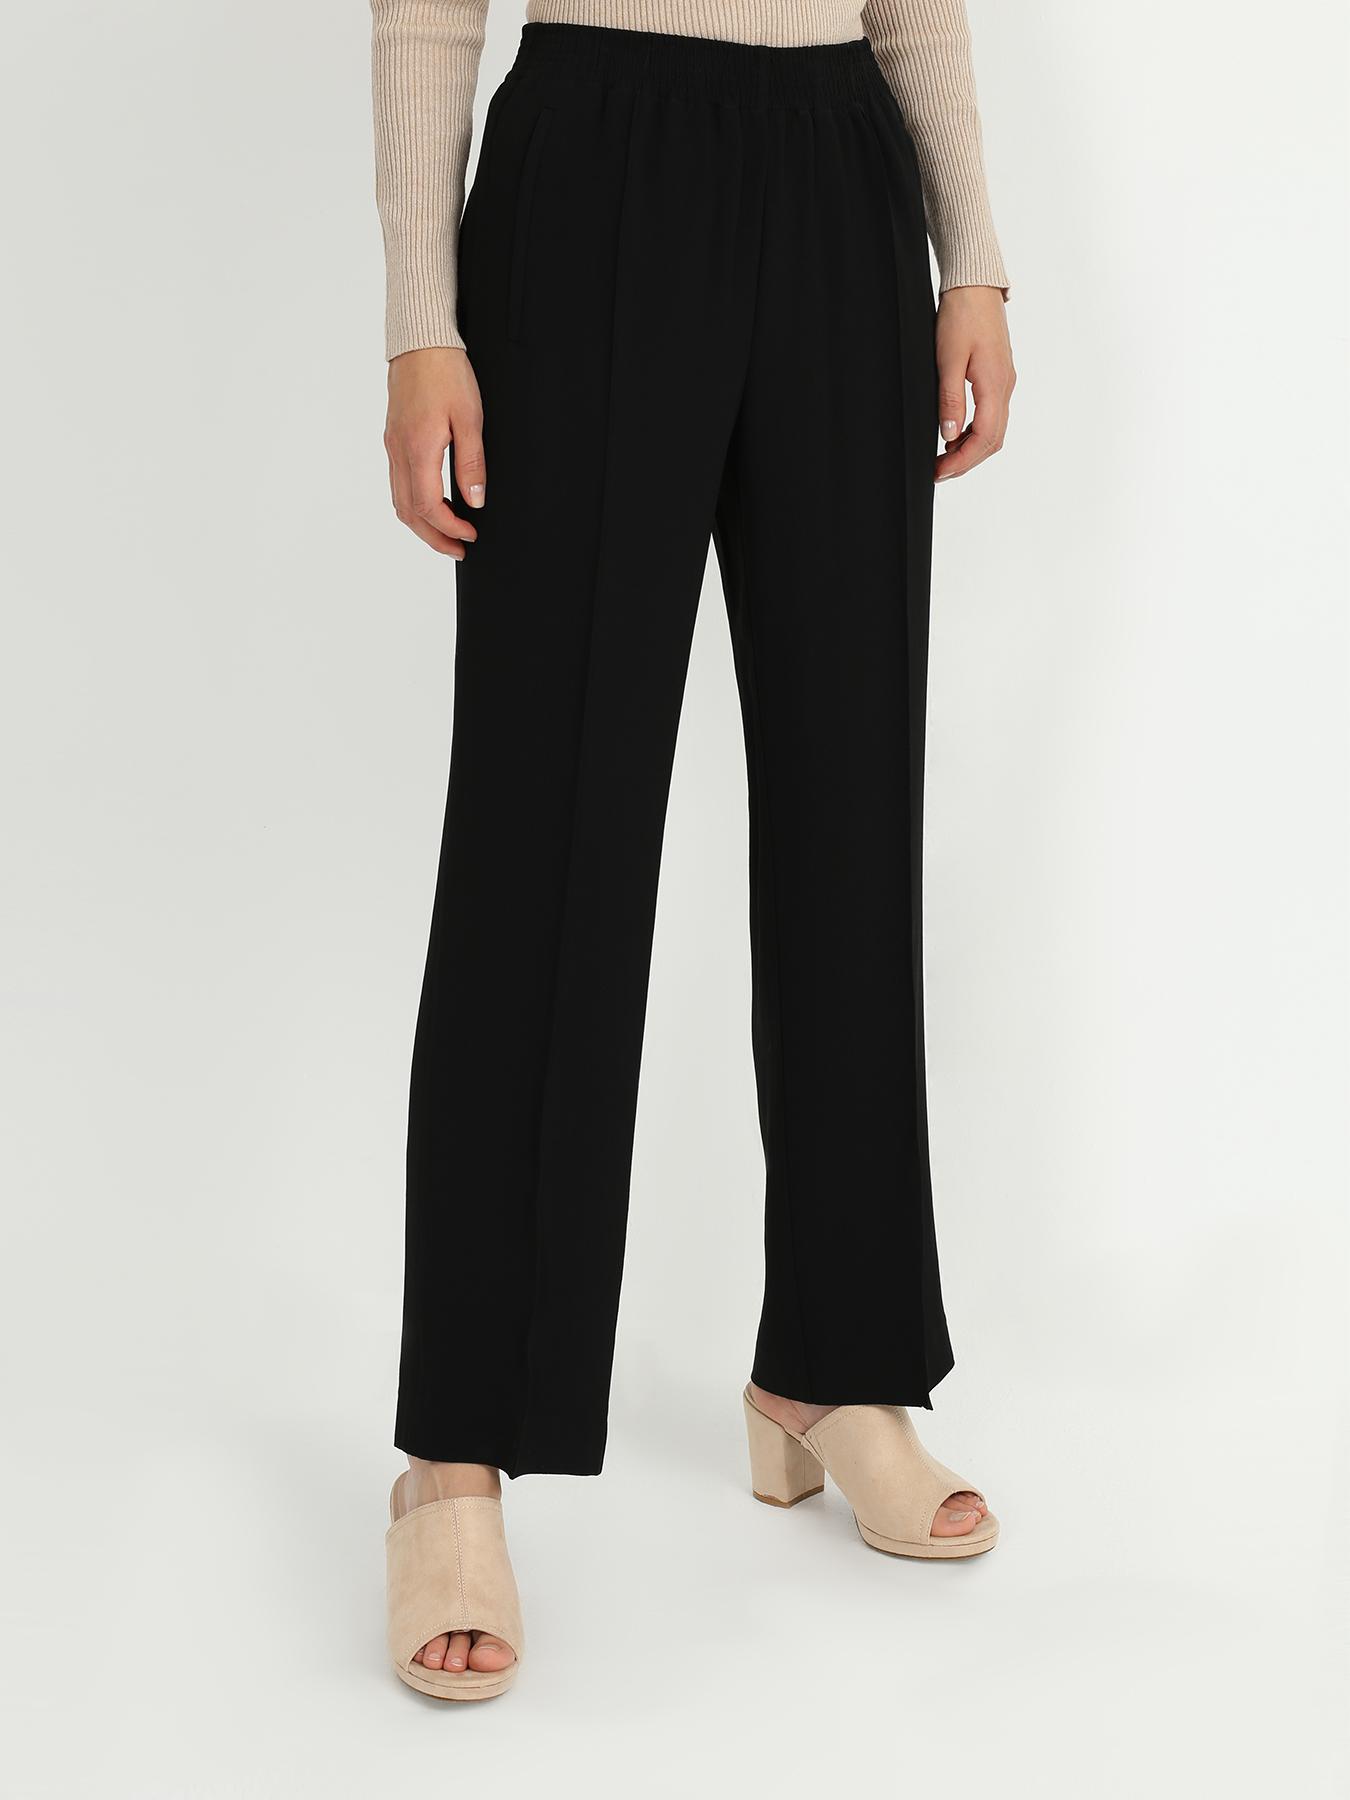 TWINSET TWINSET Классические брюки